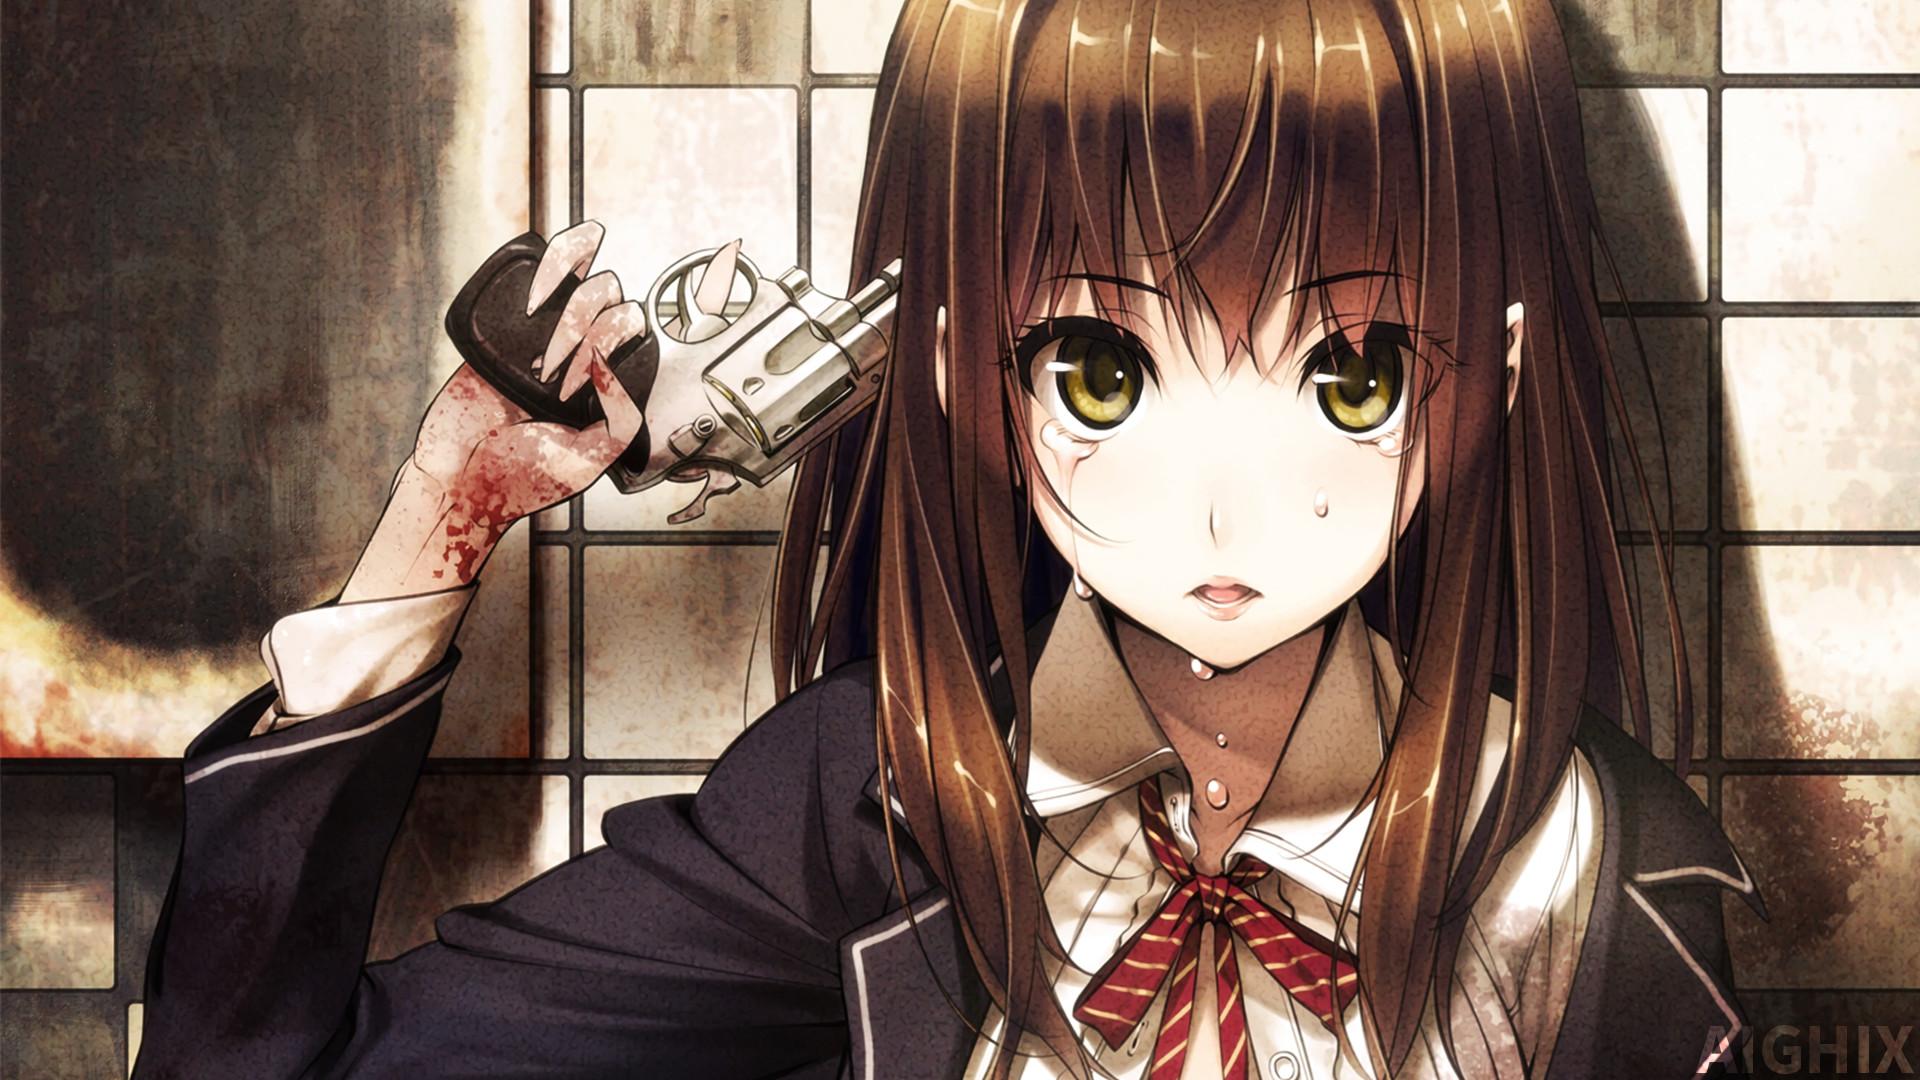 … Sad Anime Girl With Gun Wallpaper by AIGHIX